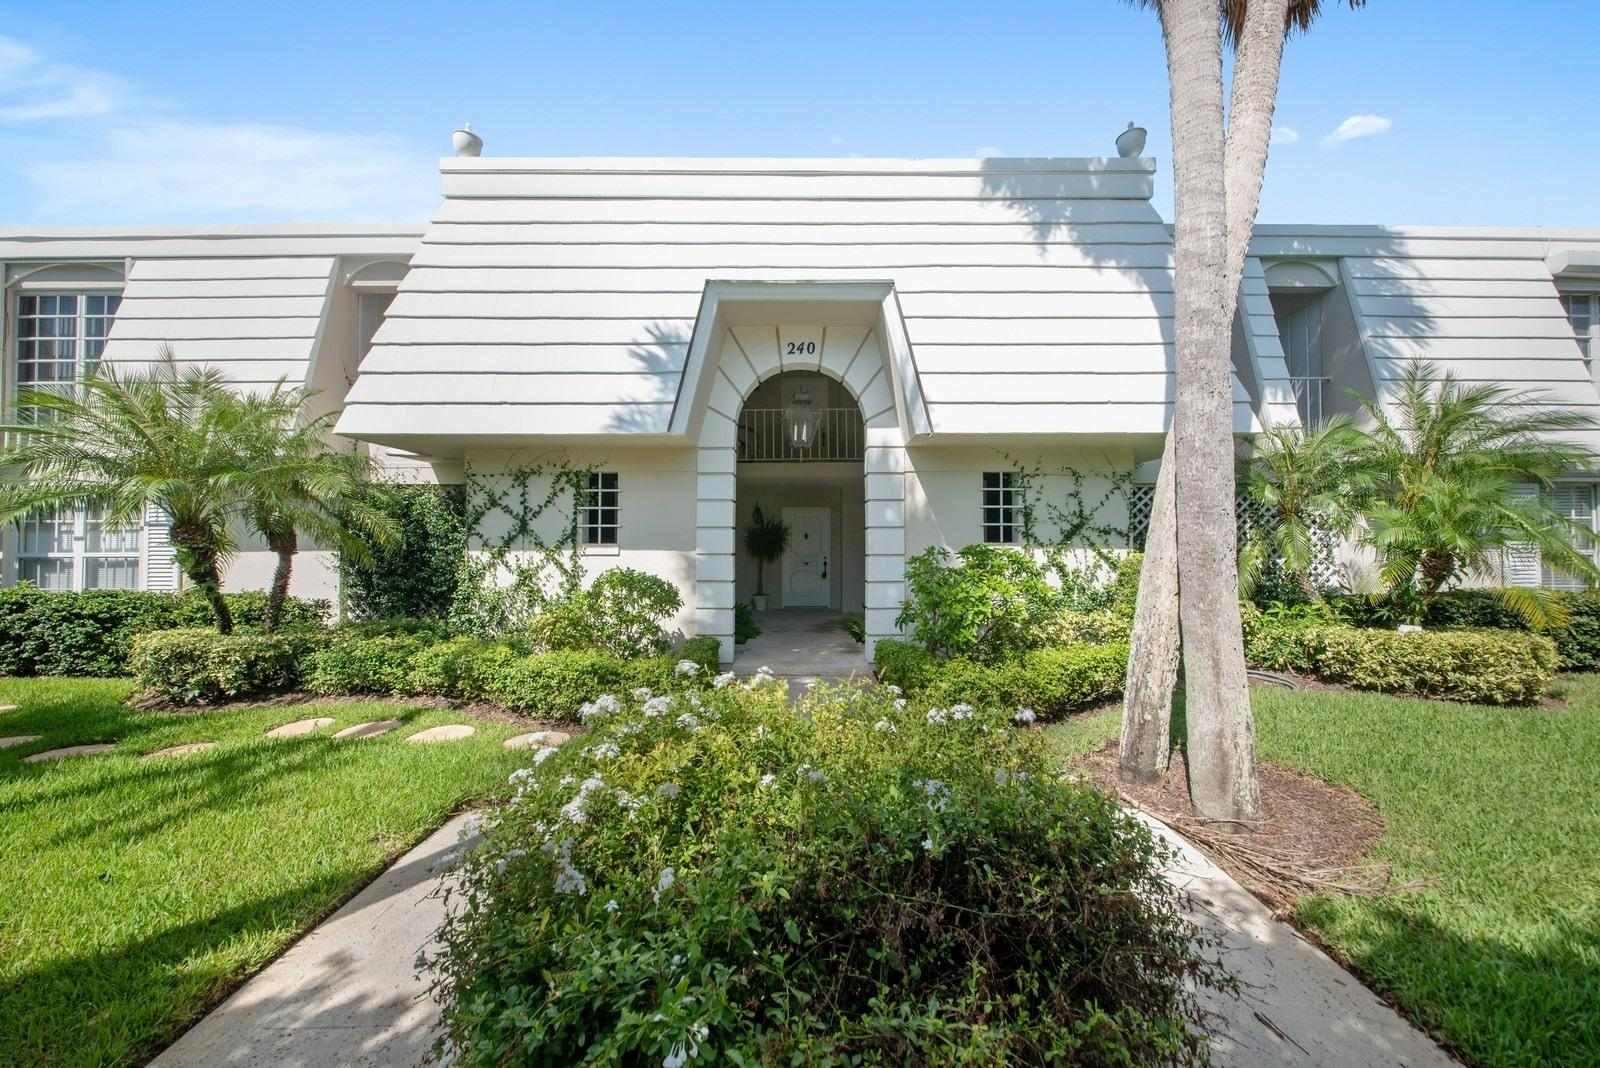 240 N County Road, Palm Beach, FL 33480